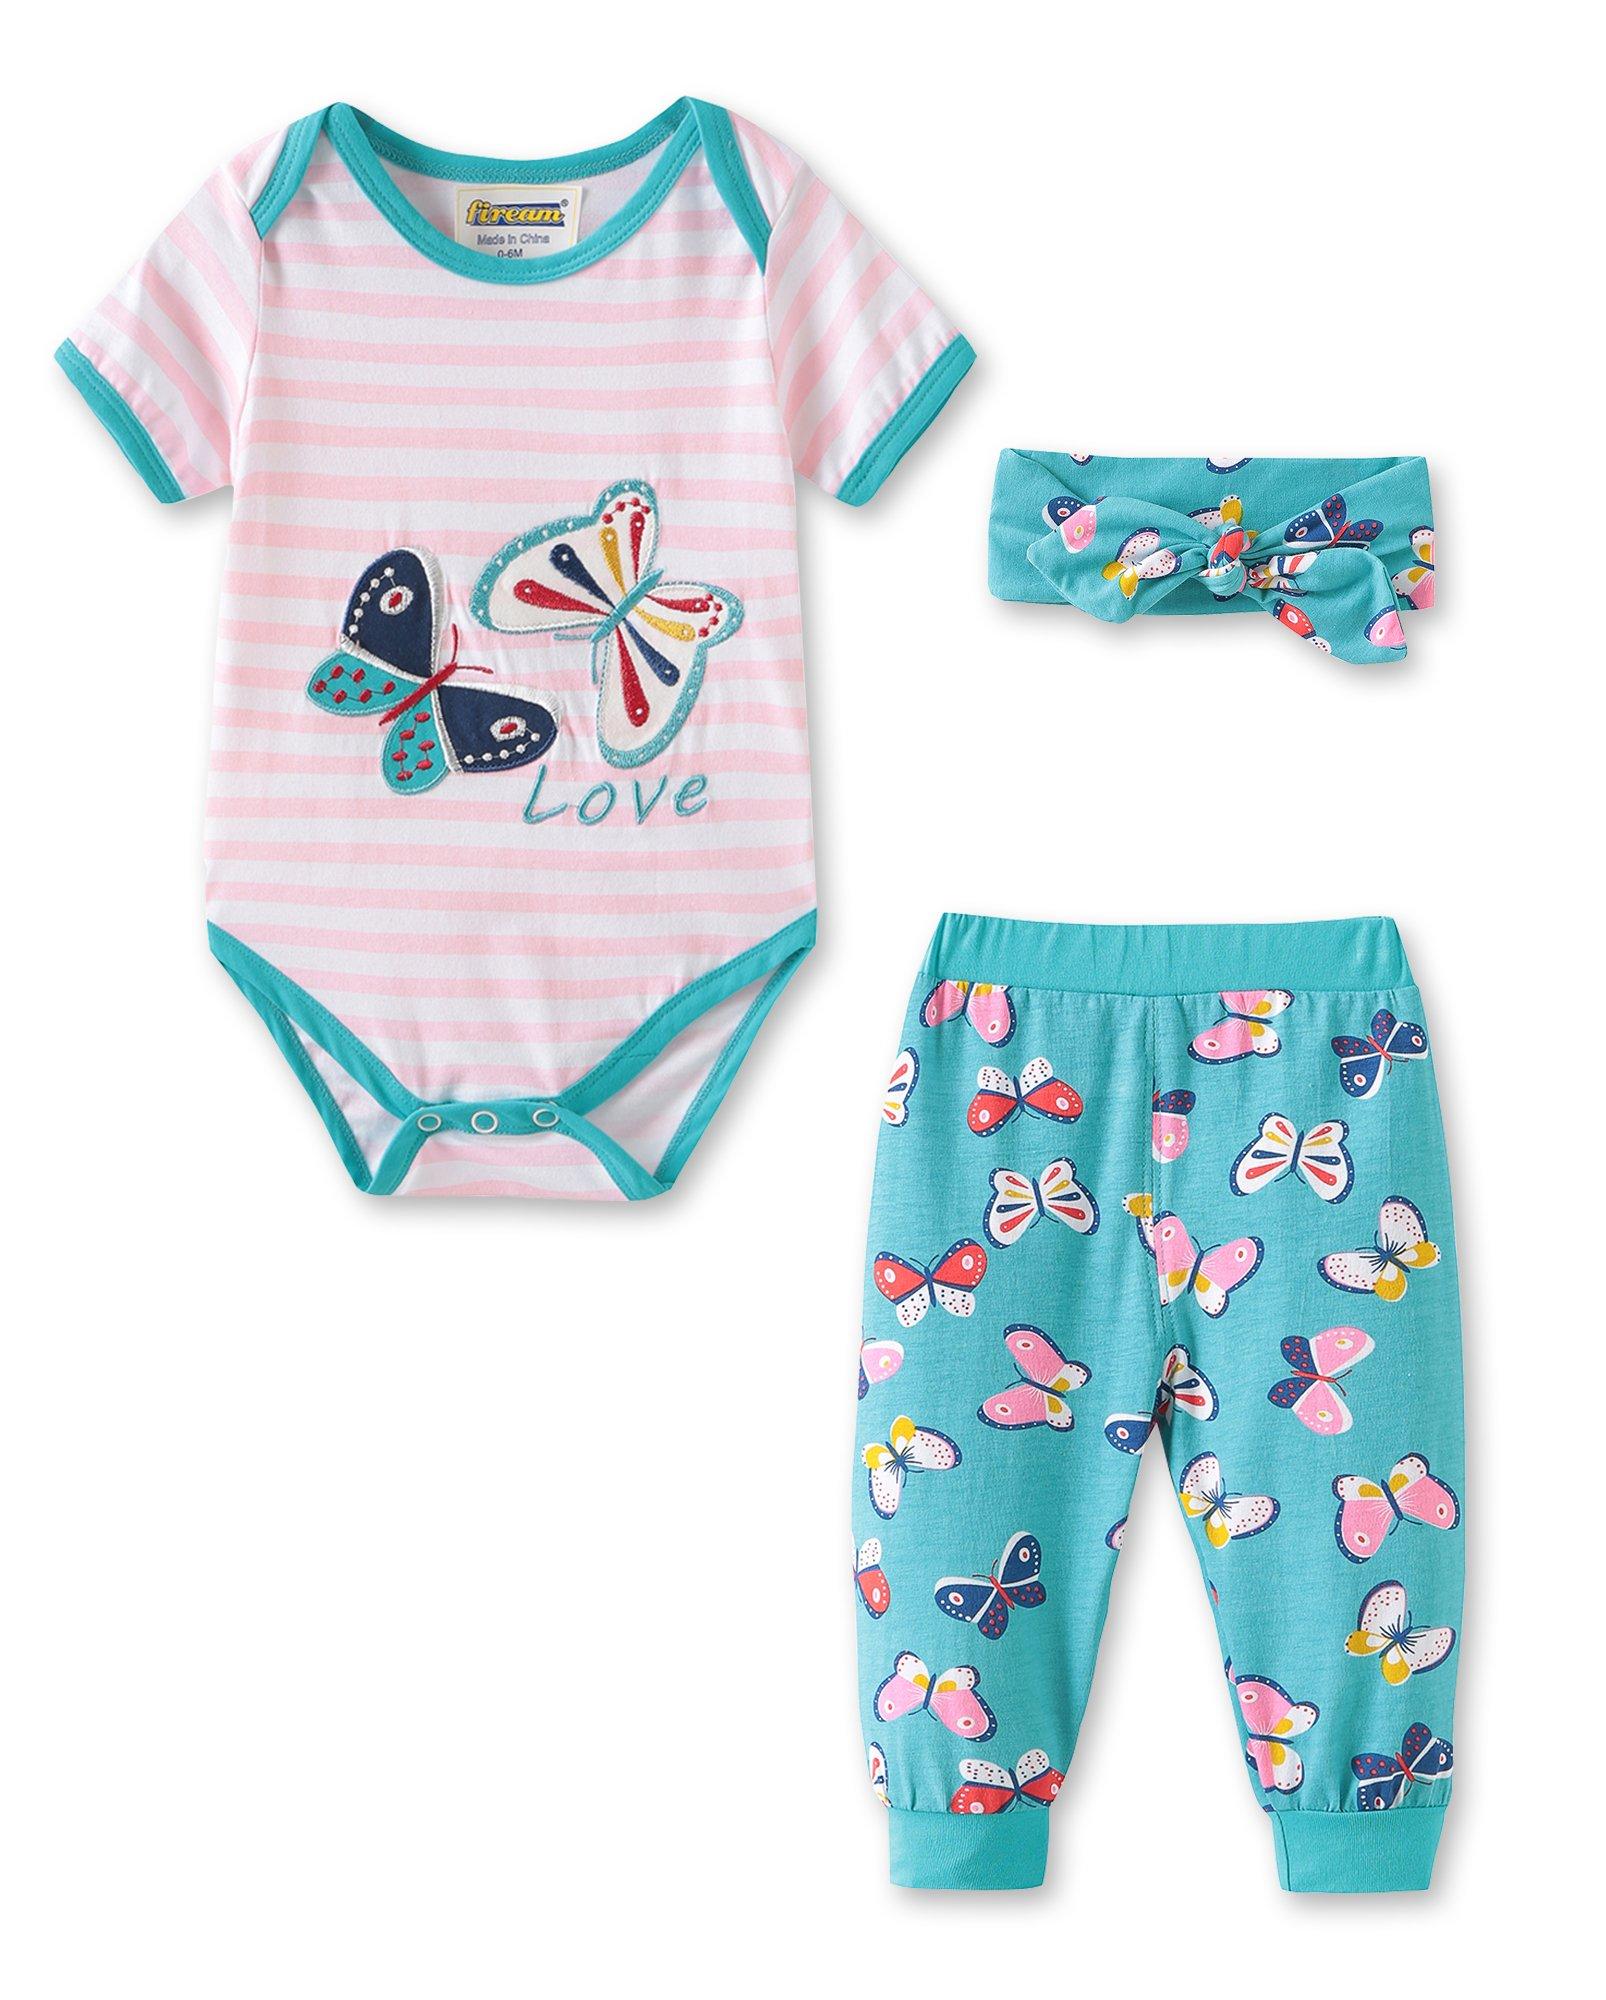 Fiream Baby Girls Clothes Infant Romper Bodysuit + Headband 3pcs Fashion Outfits Set(BA0305,12-18M)